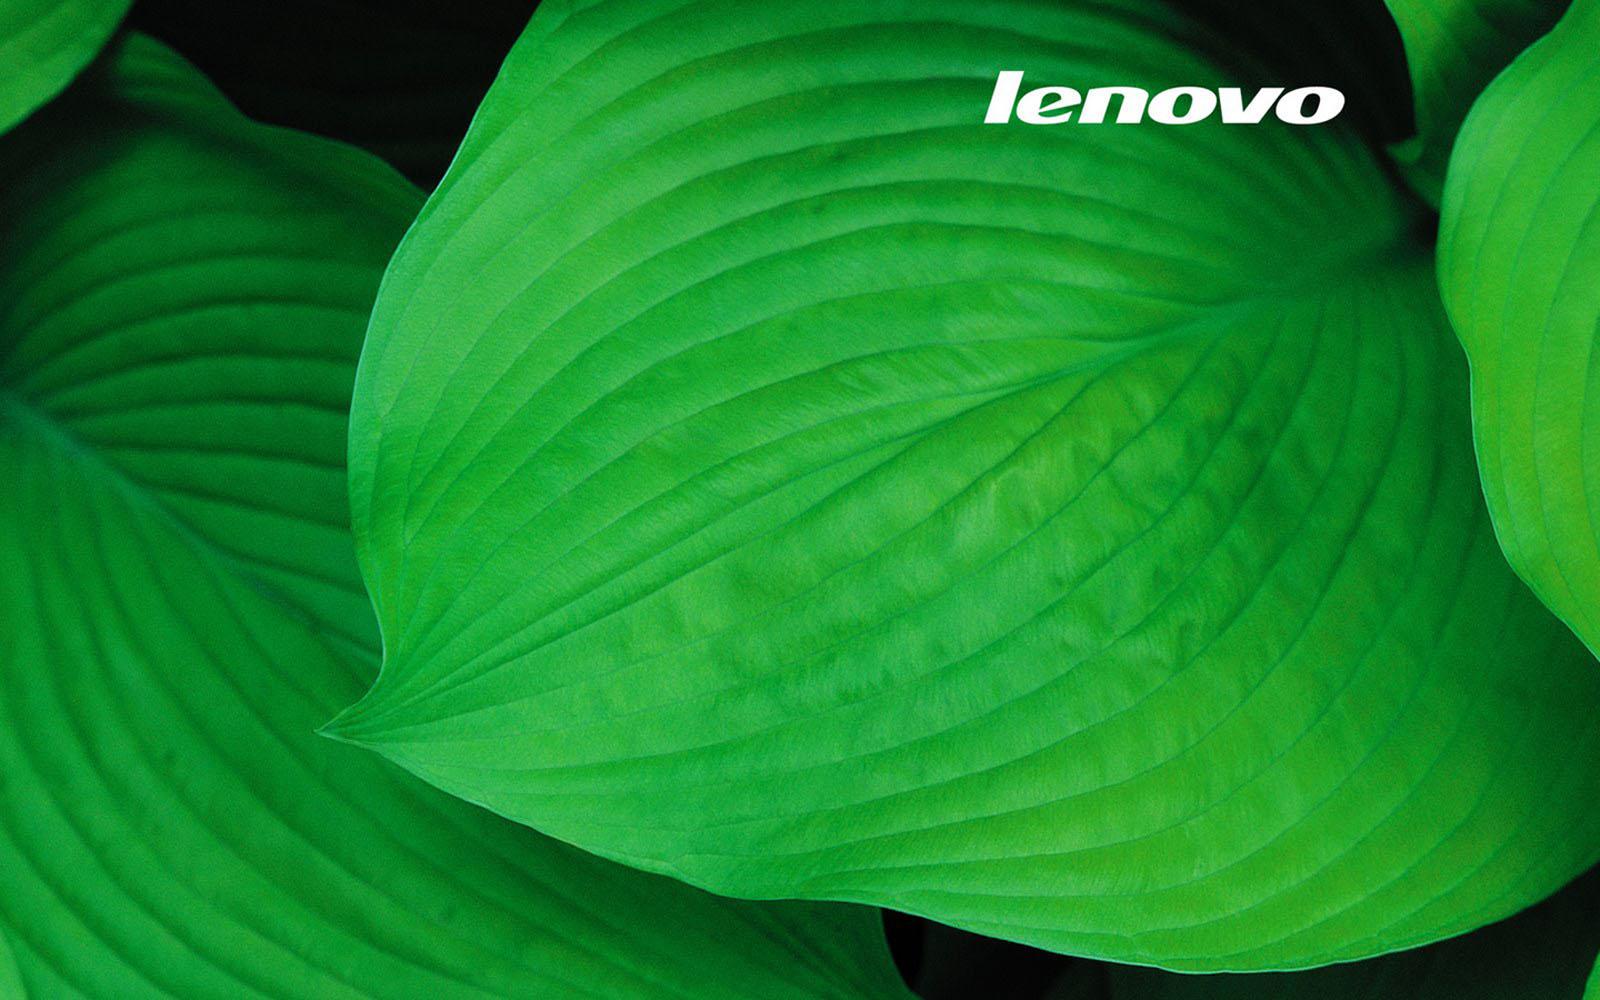 laptop wallpapers lenovo laptop desktop wallpapers lenovo laptop 1600x1000